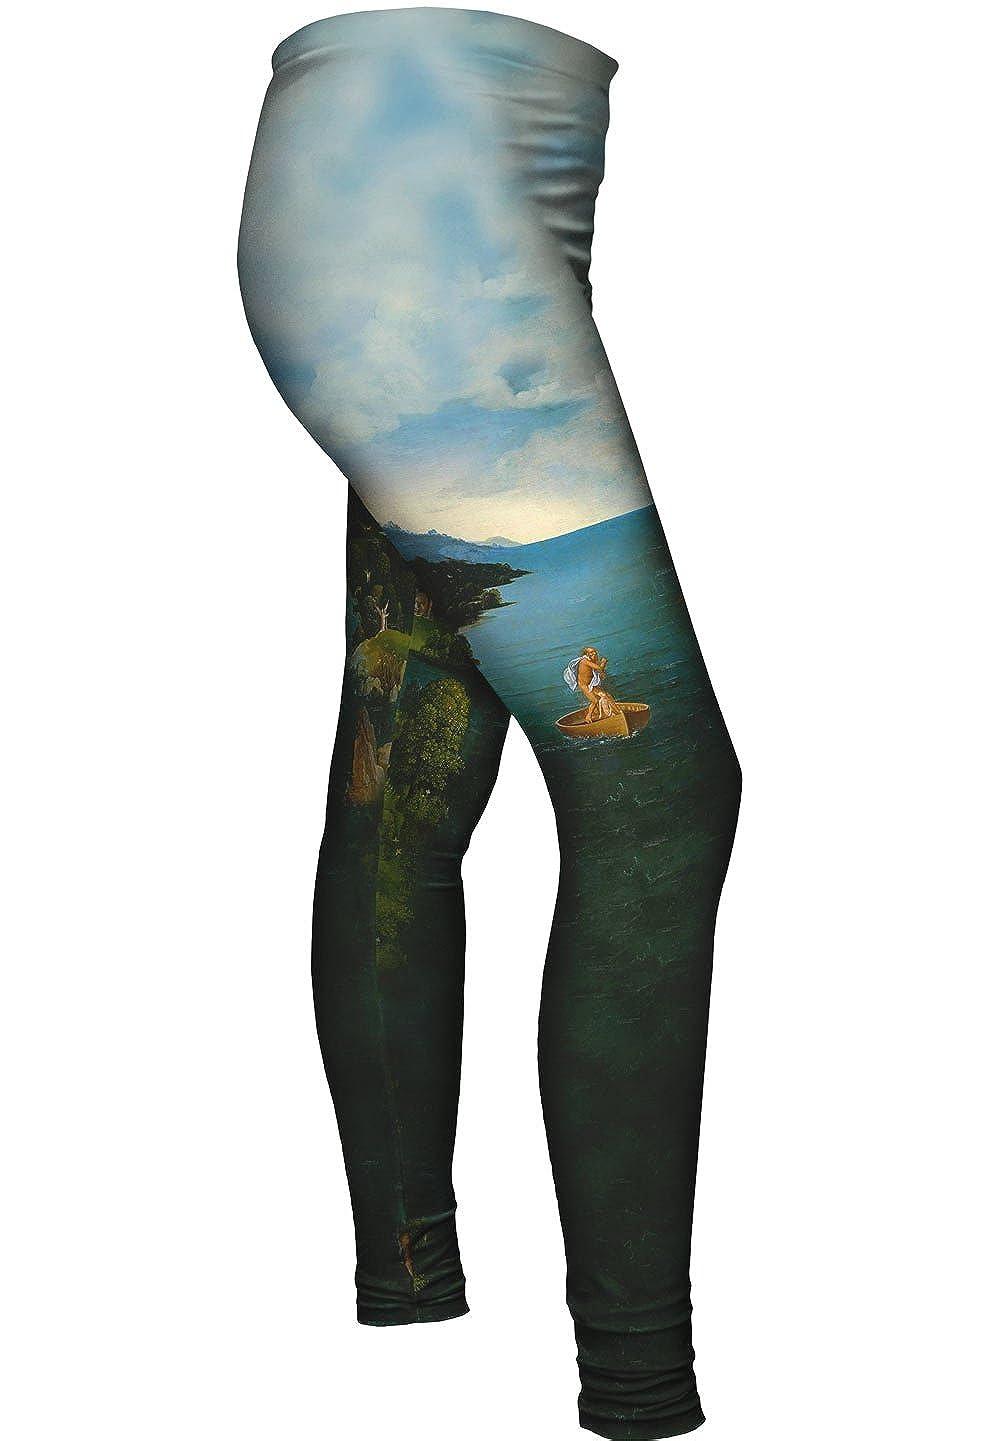 Charon Crossing t -New Ladies Womens Leggings 2061 Yizzam Joachim Patinir